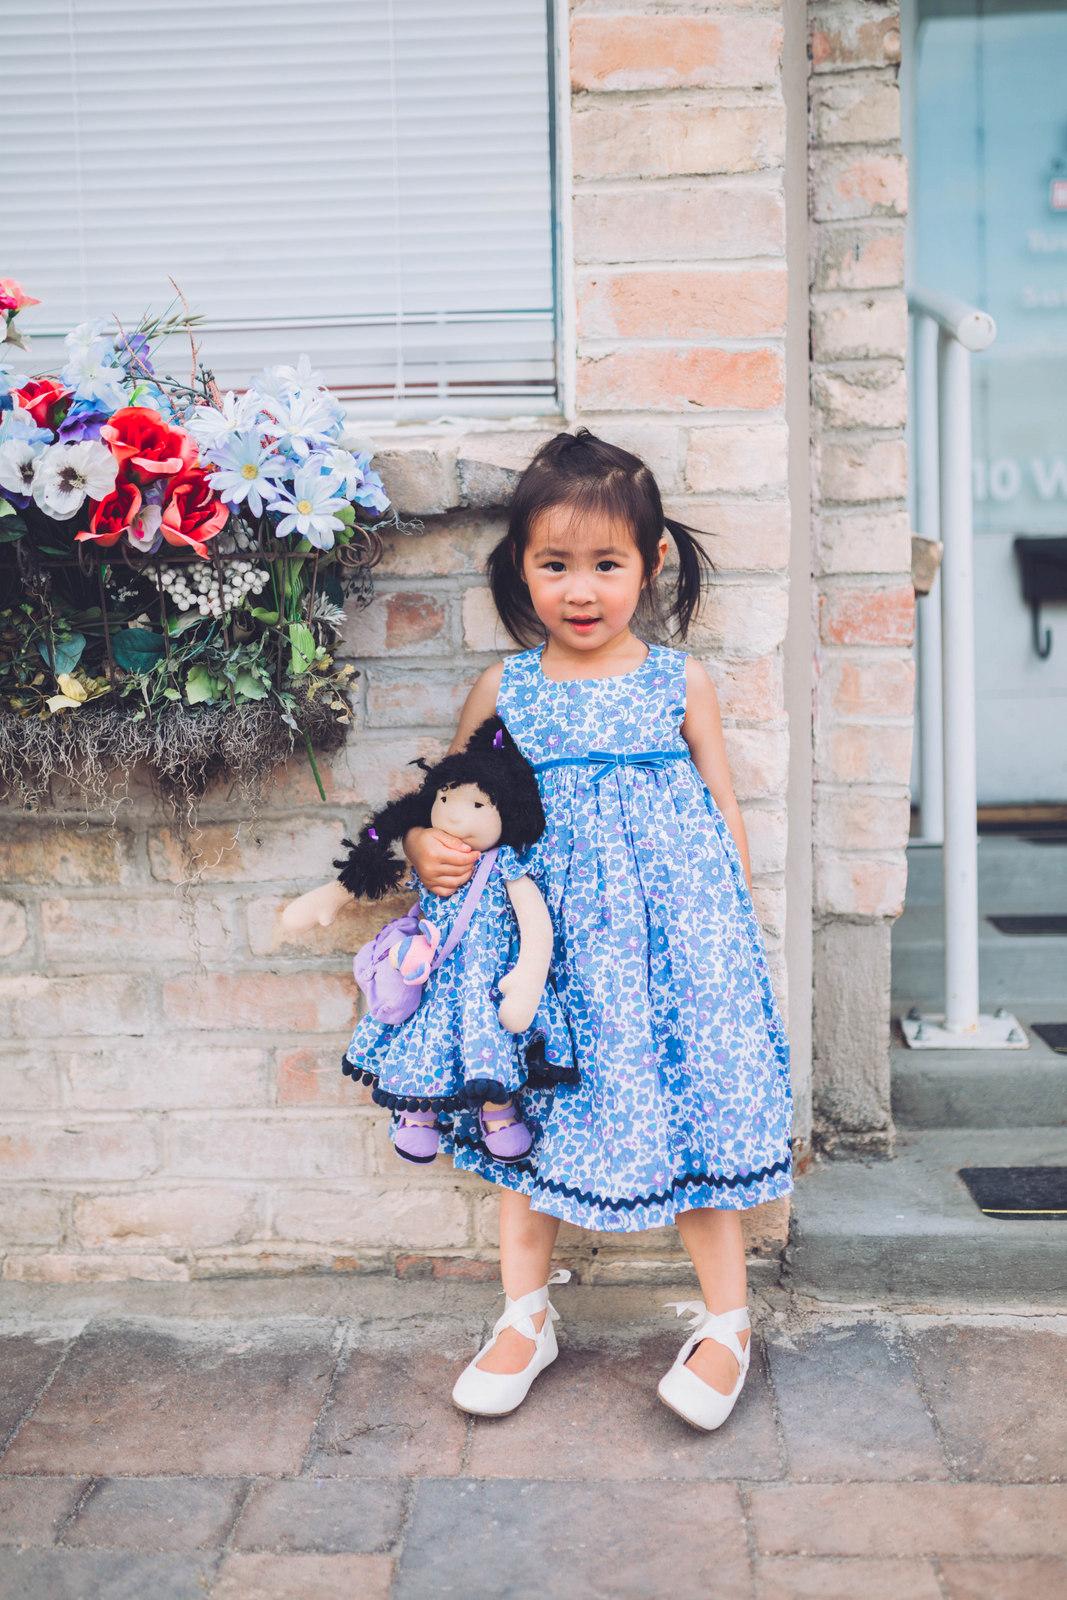 Matching Girl and Doll Outfits by Utah blogger SandyALaMode